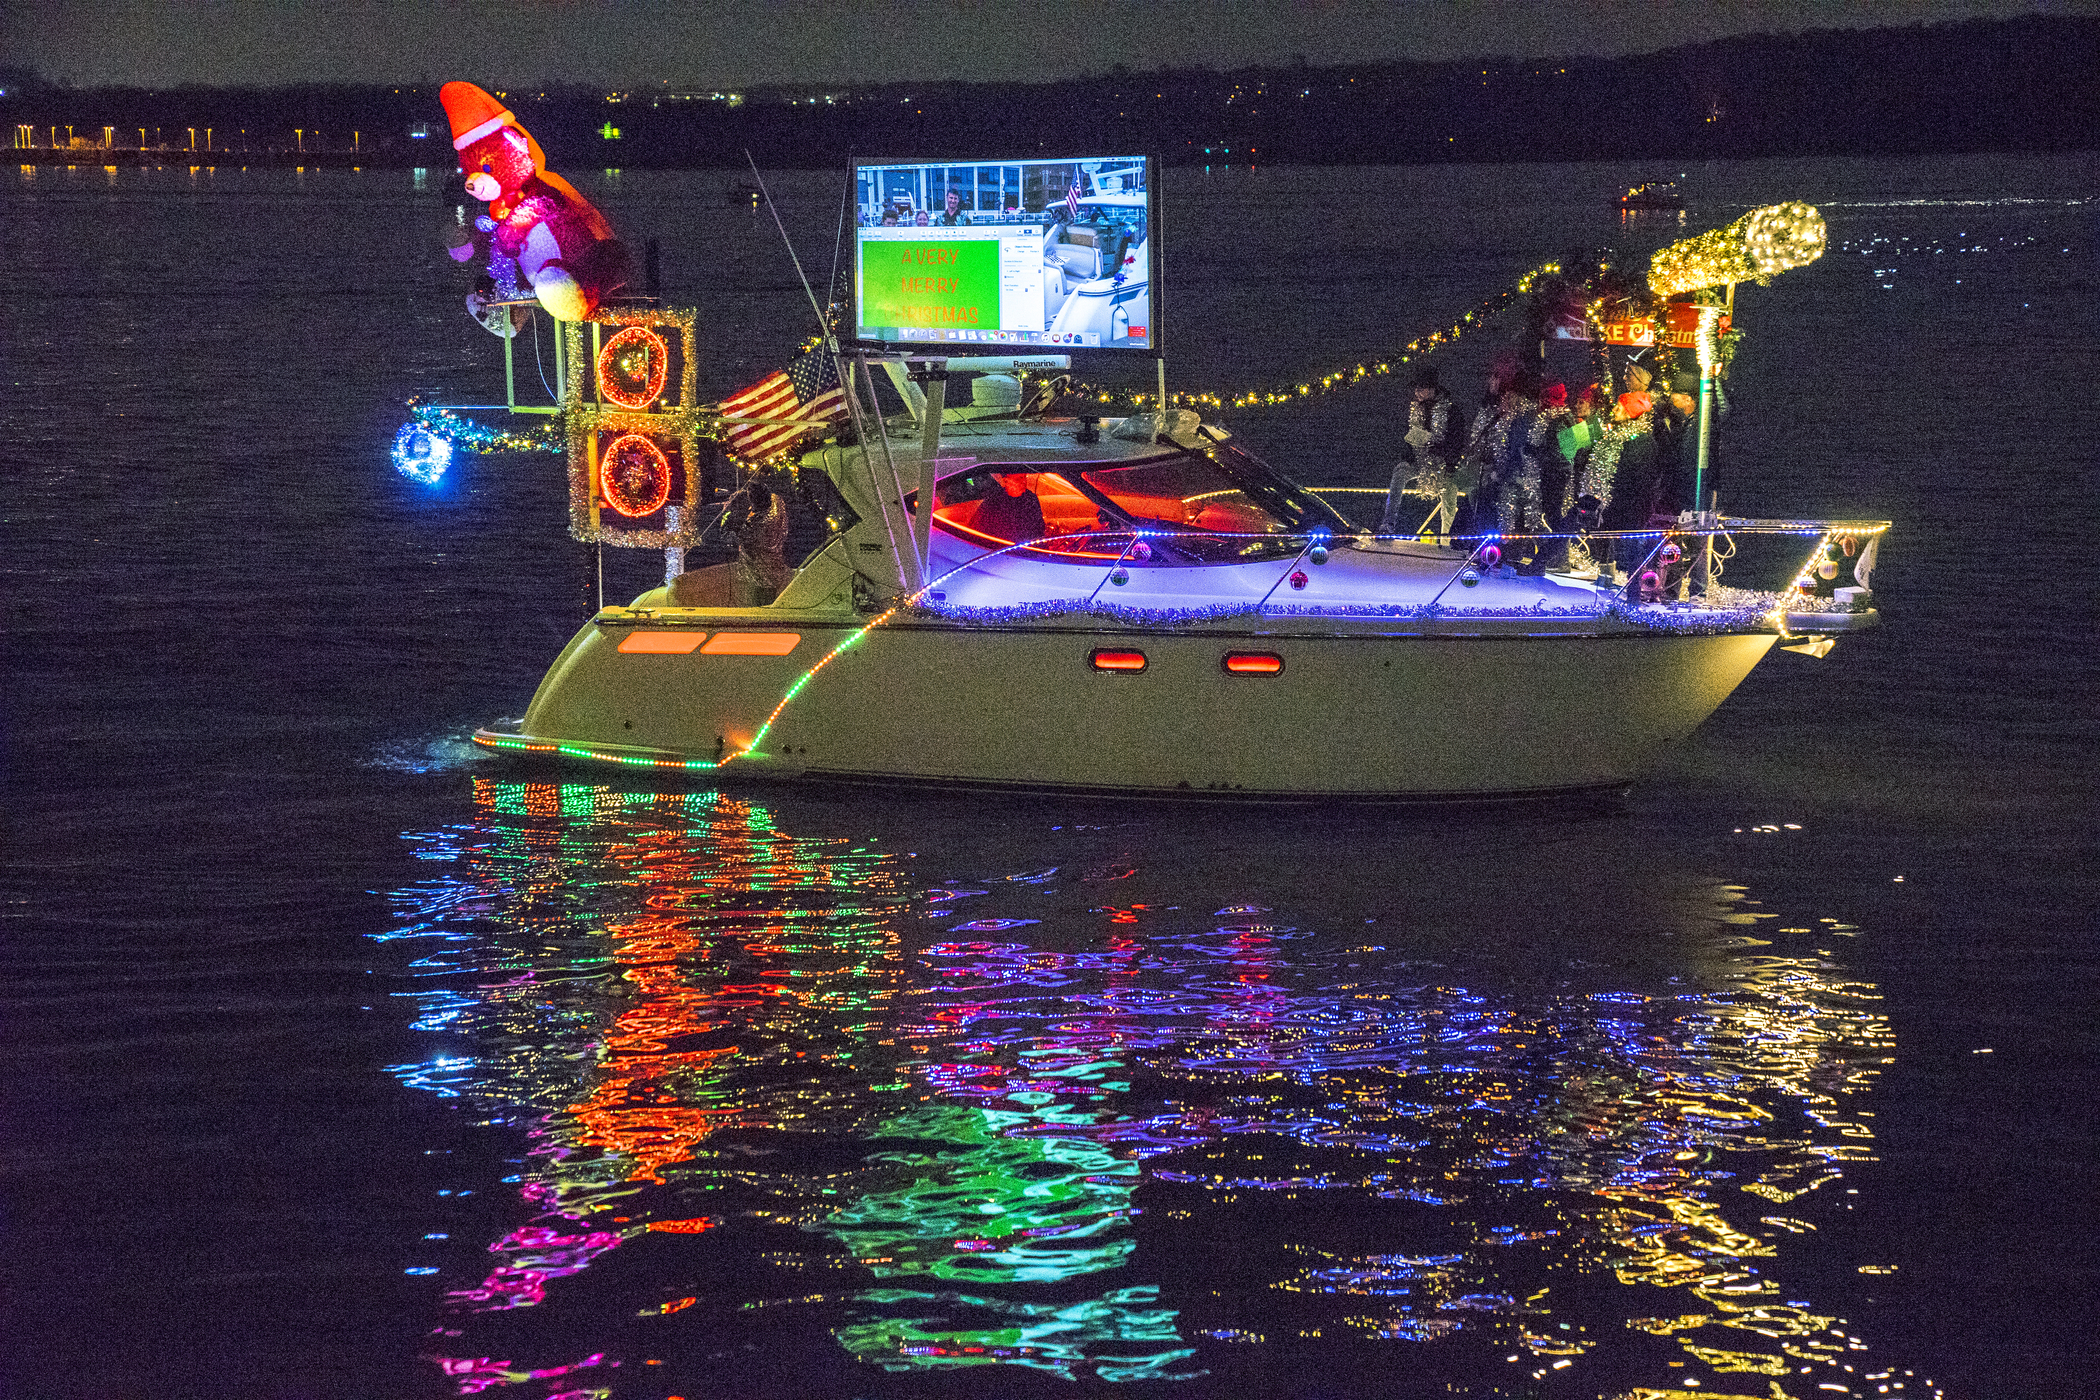 Fort Lauderdale Christmas Boat Parade.Boat Parade Of Lights Wins Usa Today Readers Choice Award